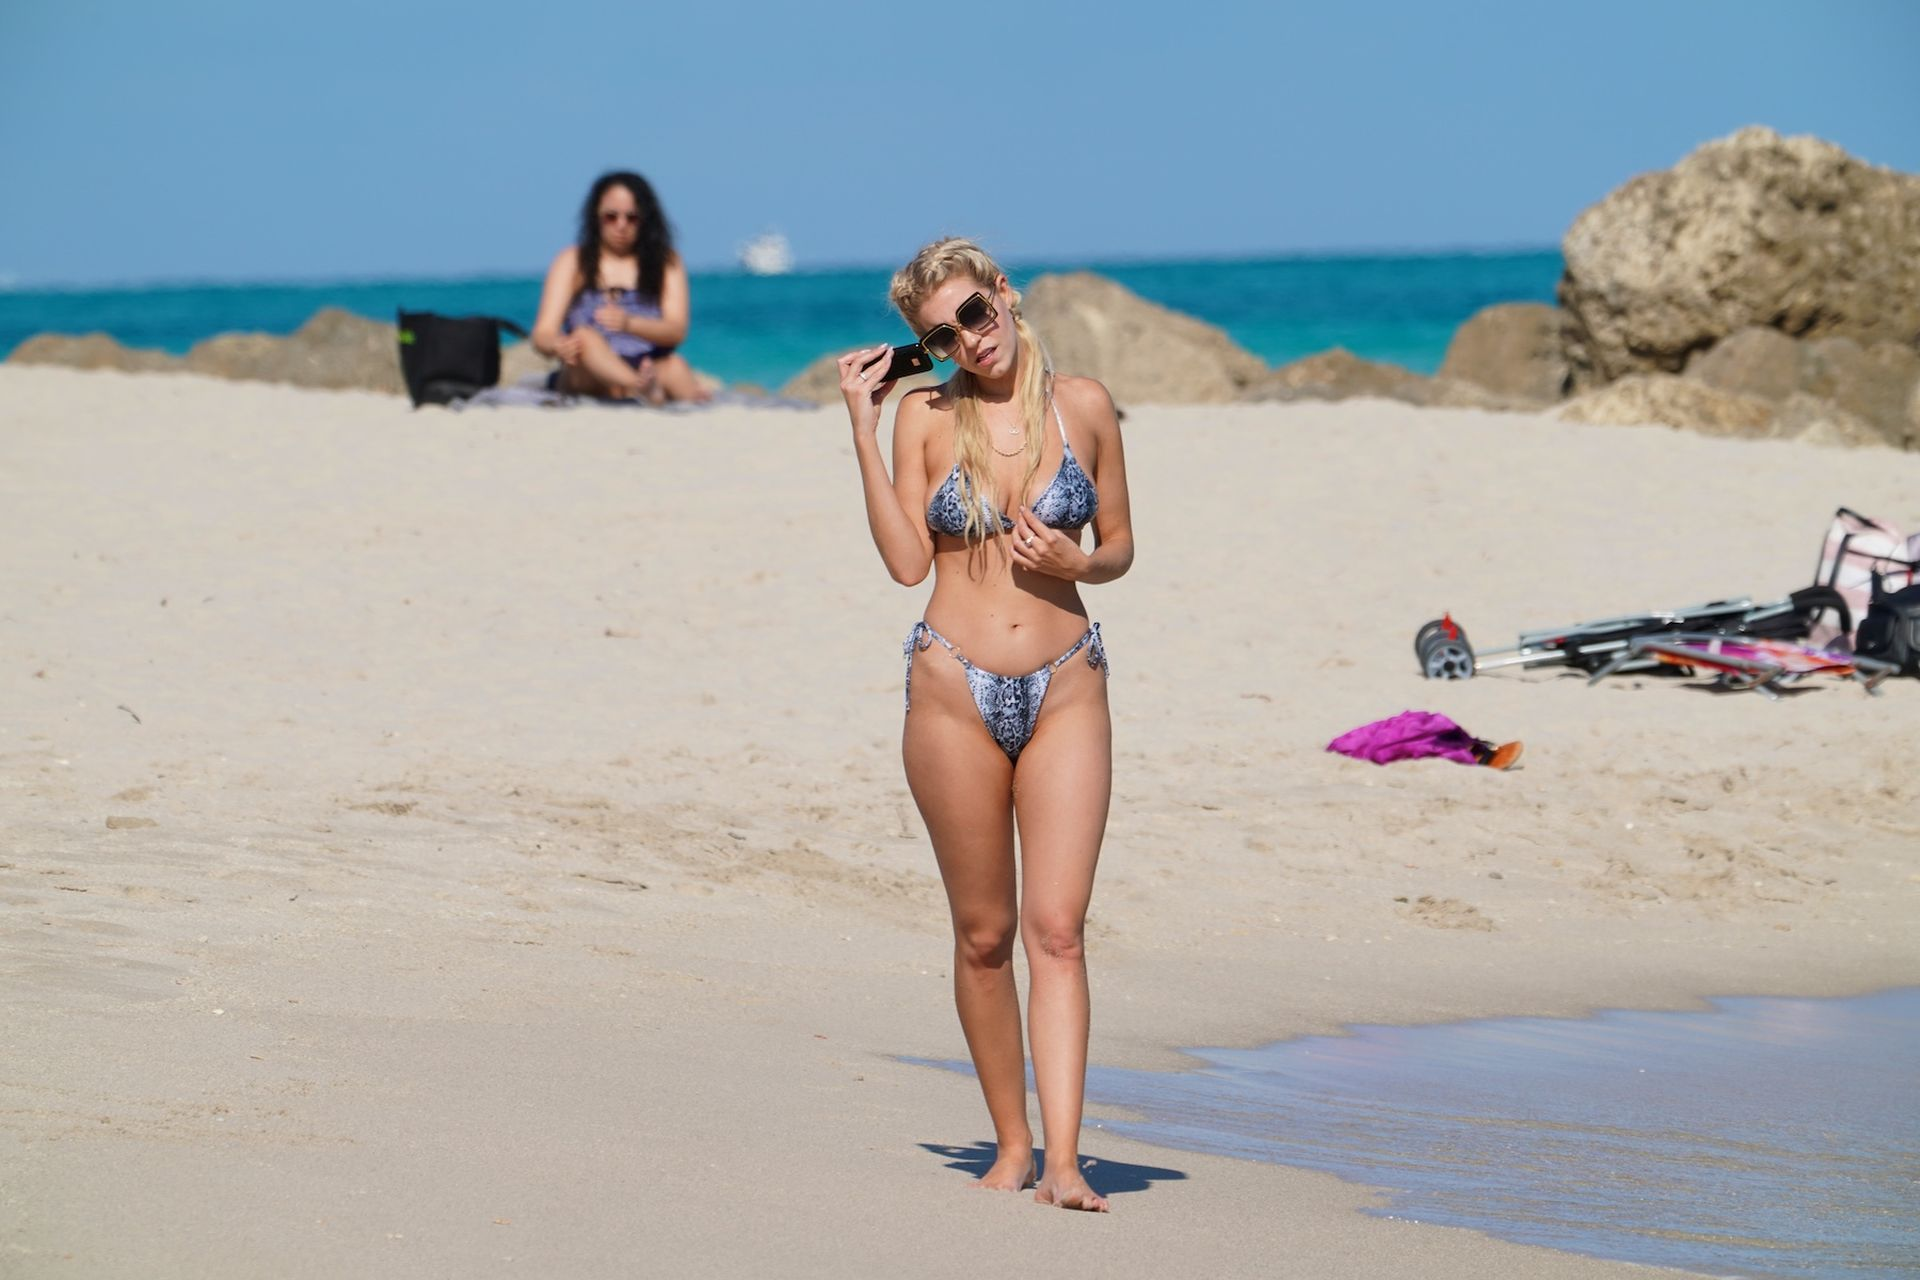 Chealse Sophia Howell Shows A Thong Bikini At The Beach In Miami 0015